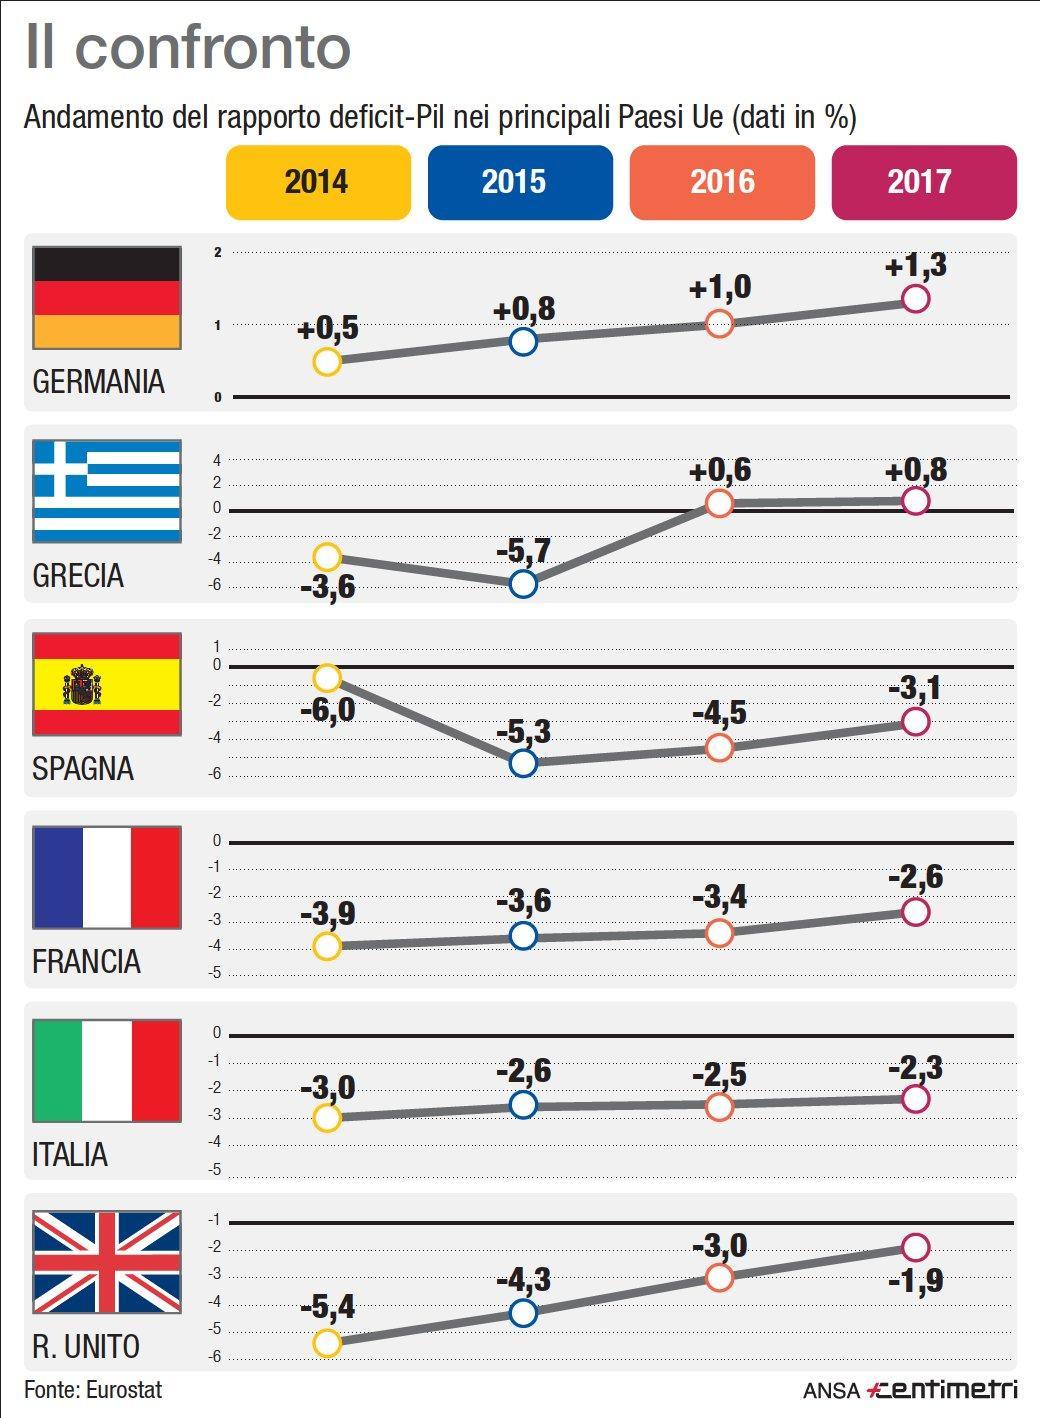 Deficit-Pil, il confronto tra i Paesi Ue